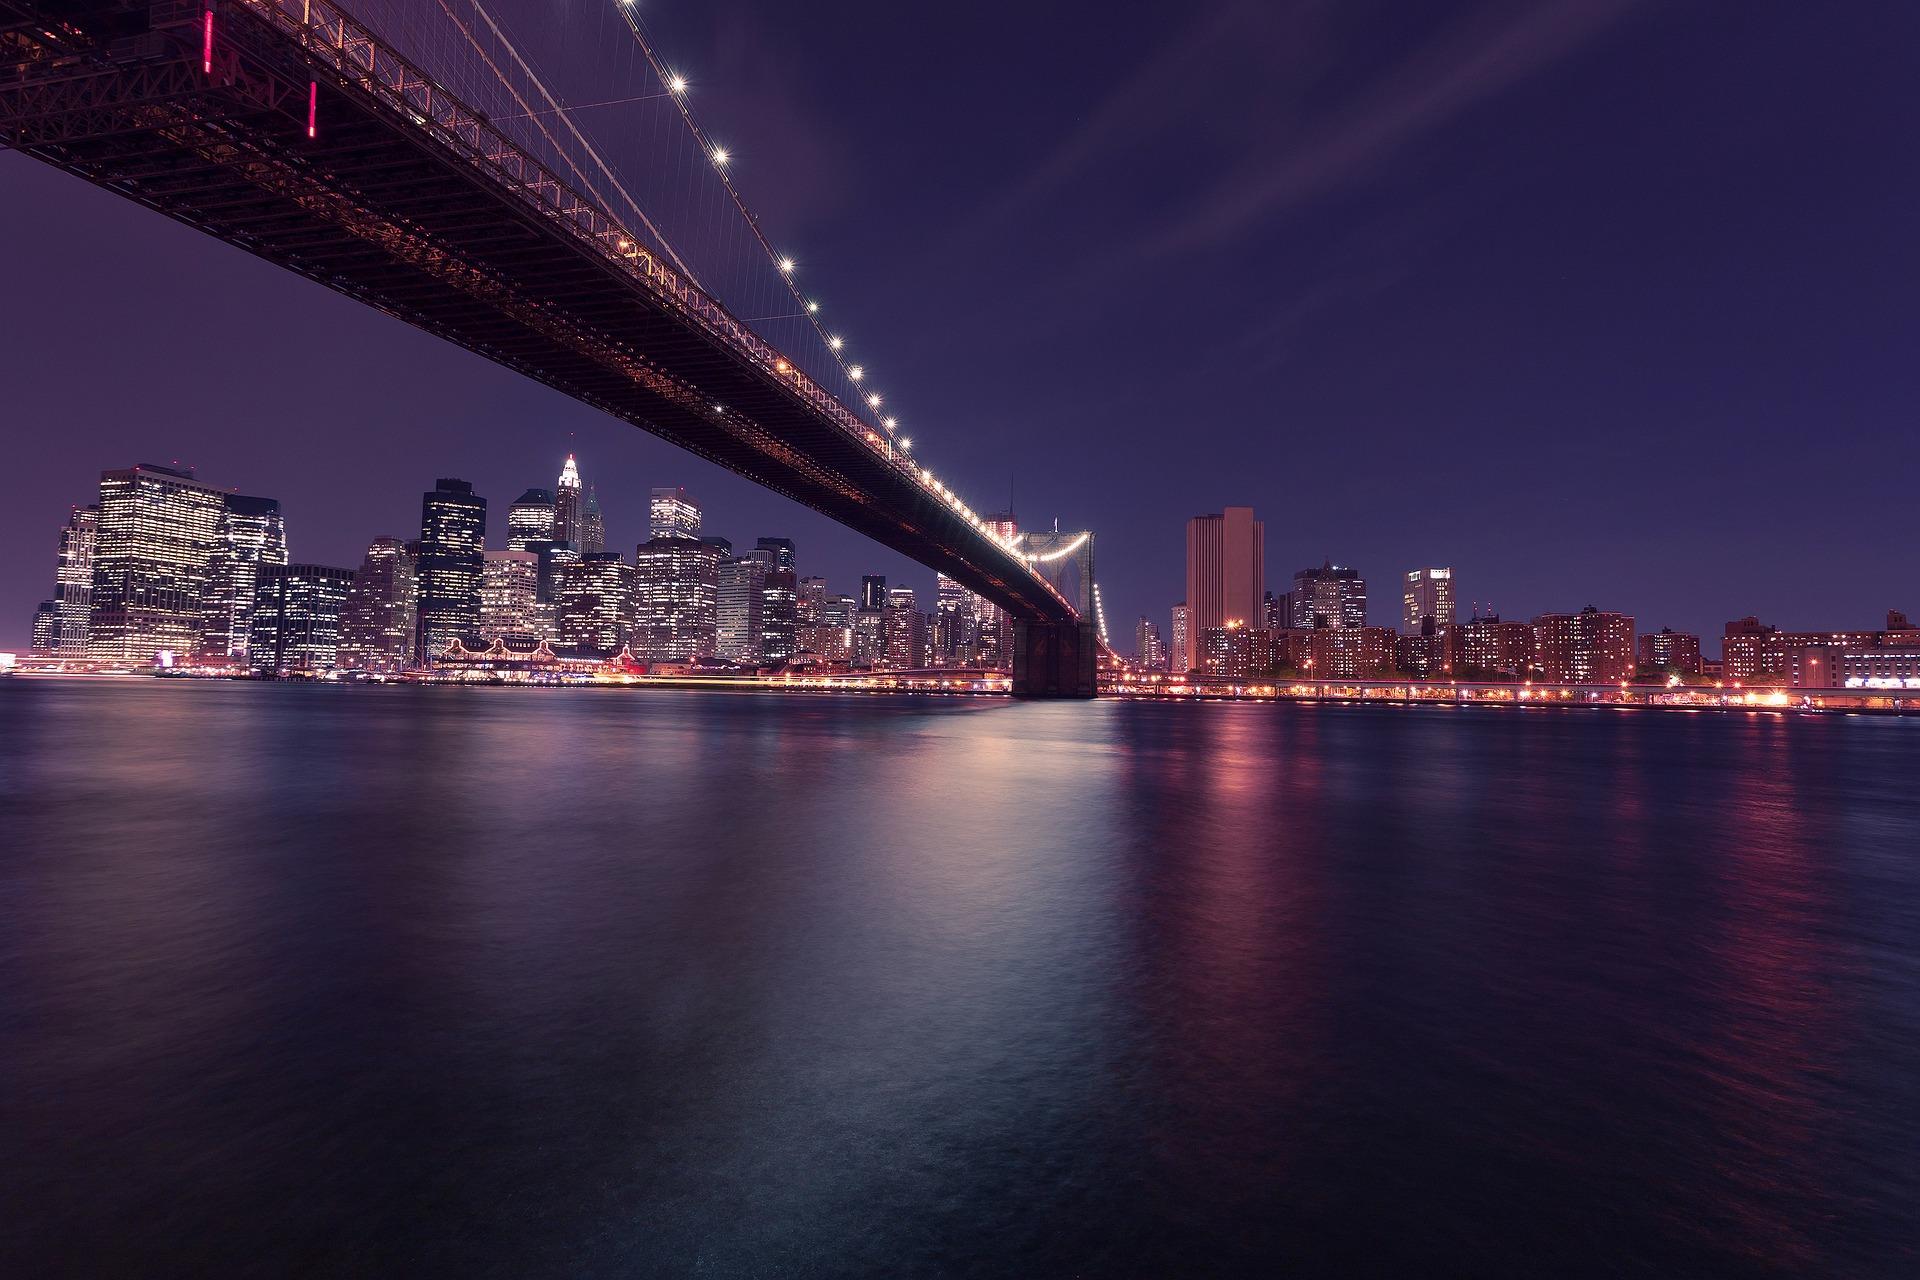 Brooklyn Bridge, New York City at night